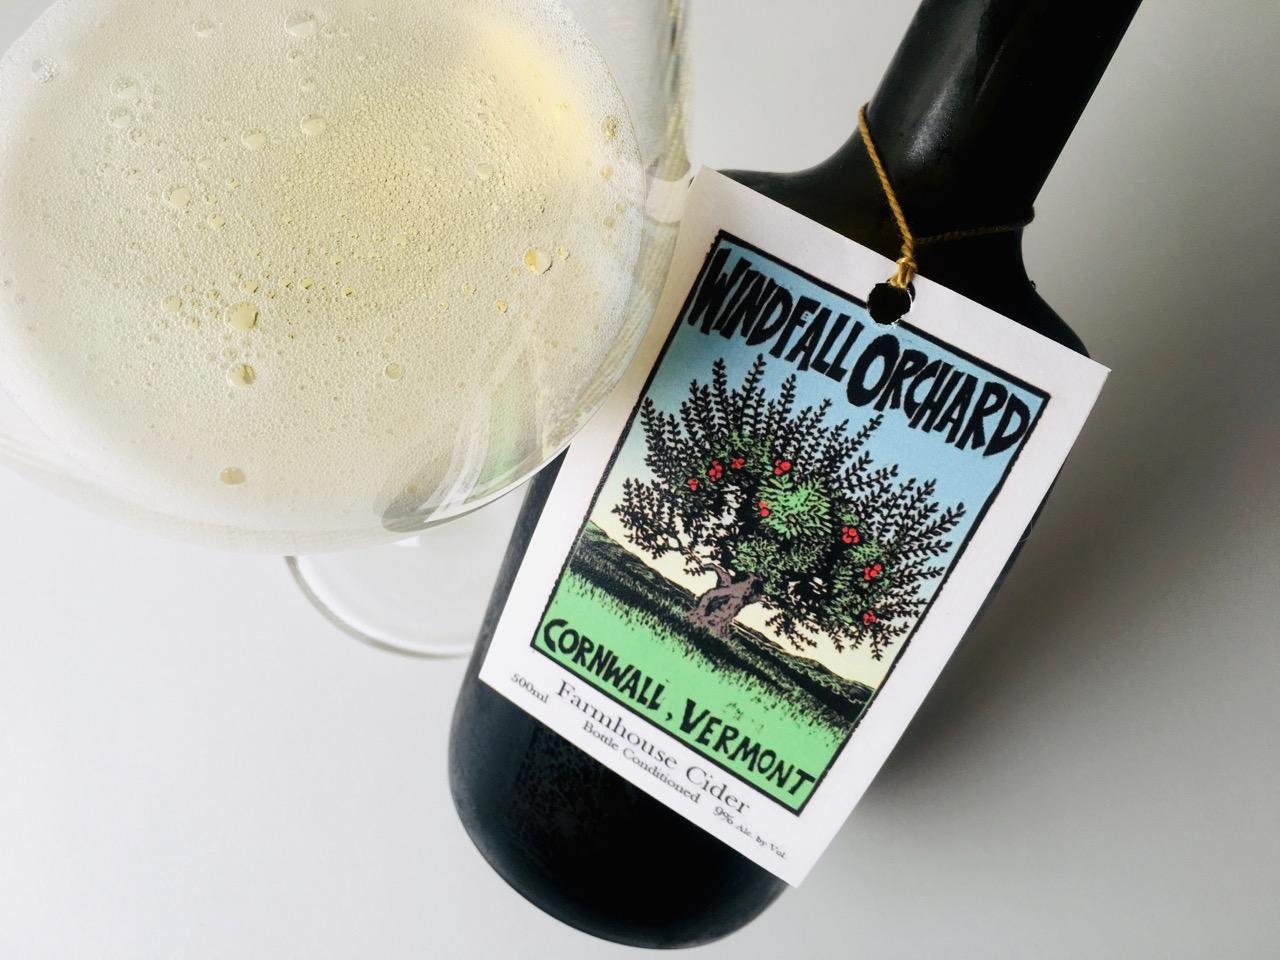 Windfall Orchard Farmhouse Cider